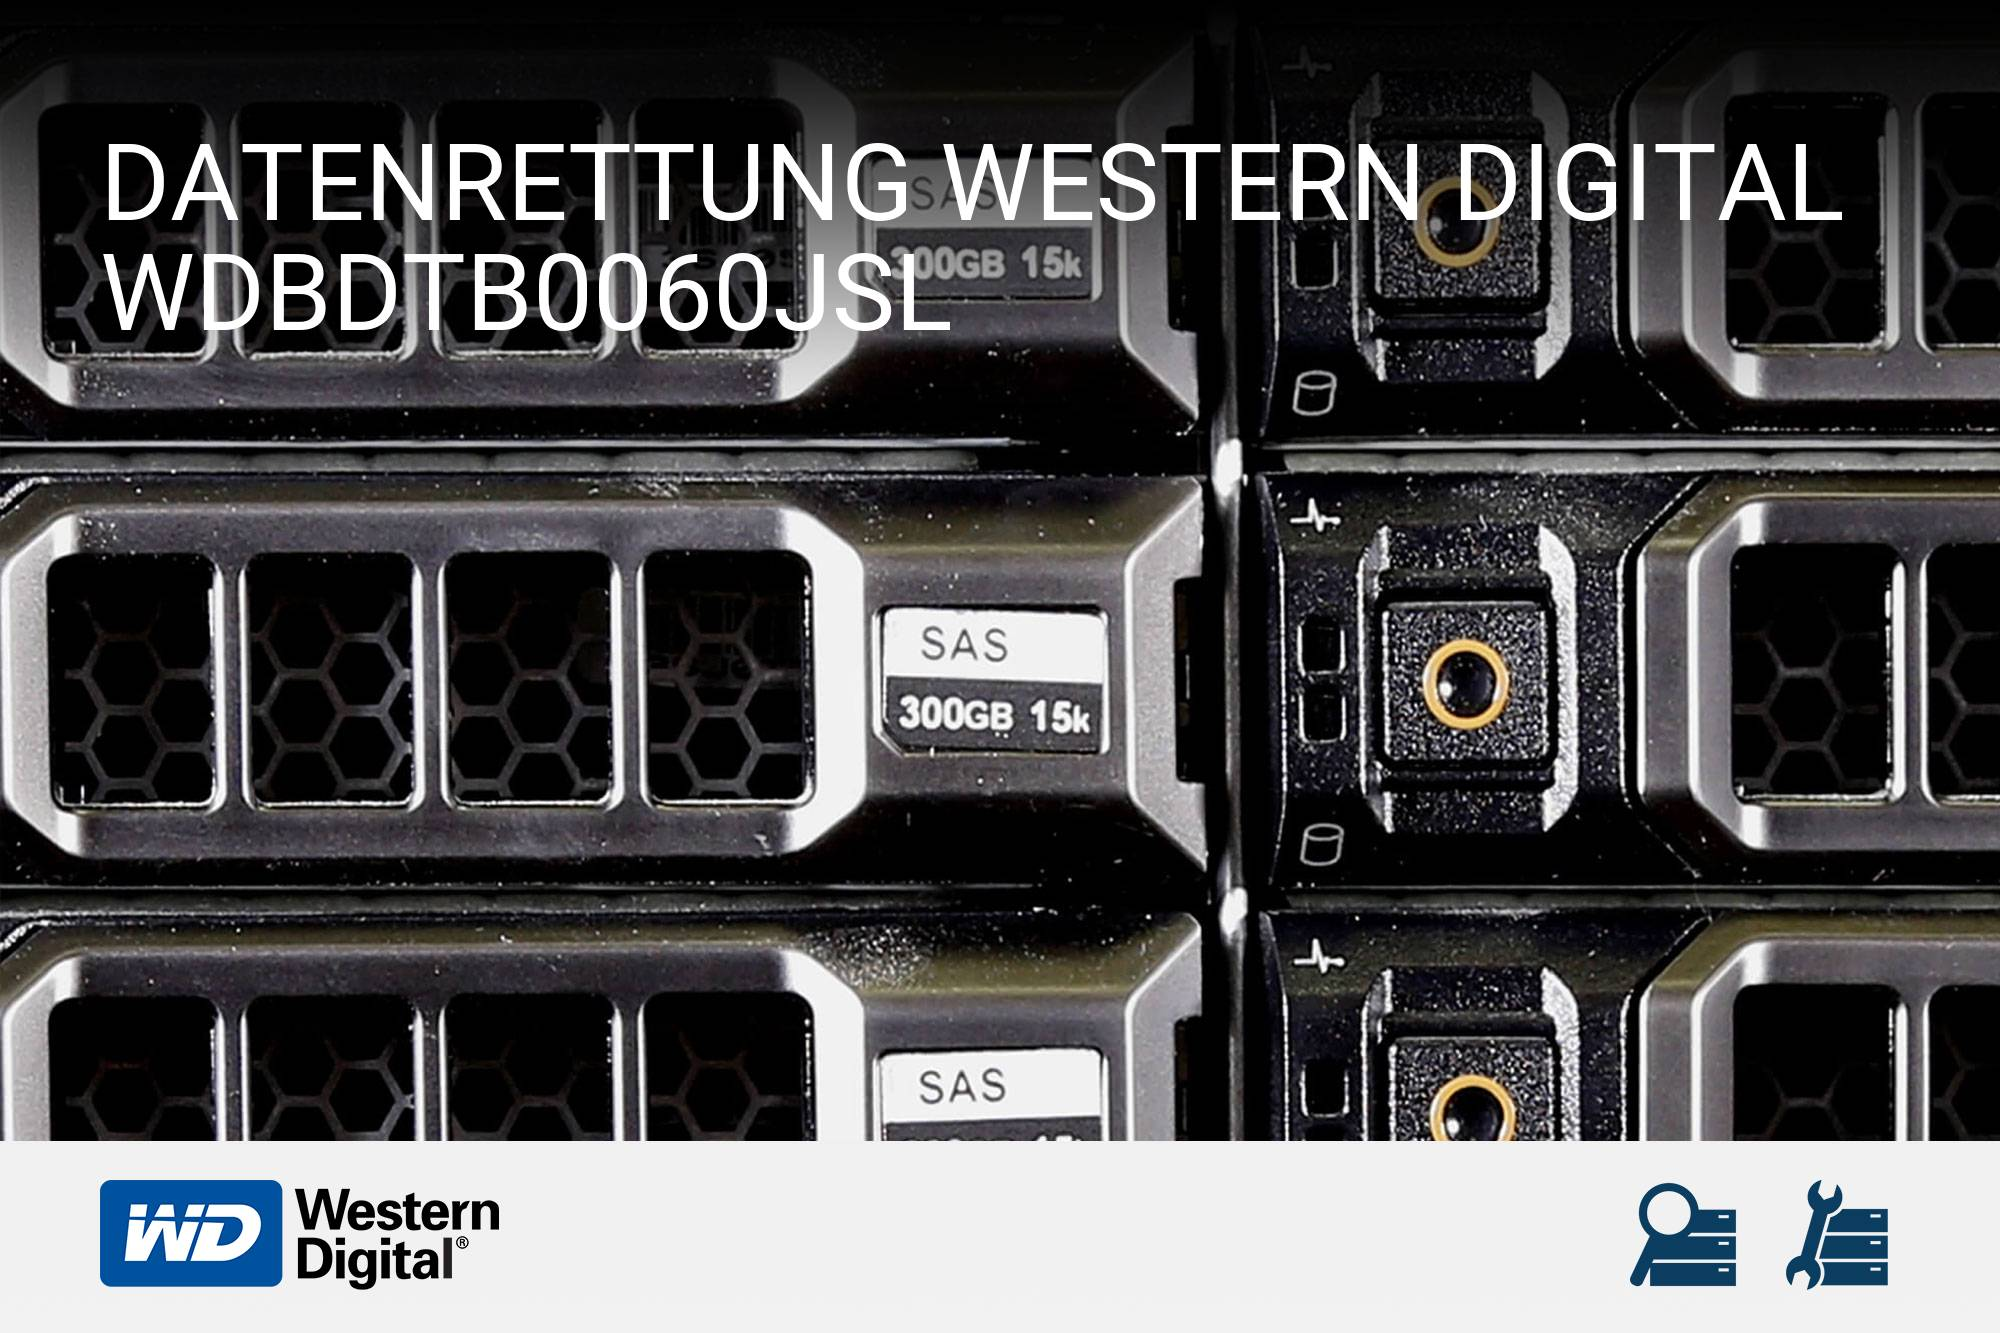 Western Digital WDBDTB0060JSL